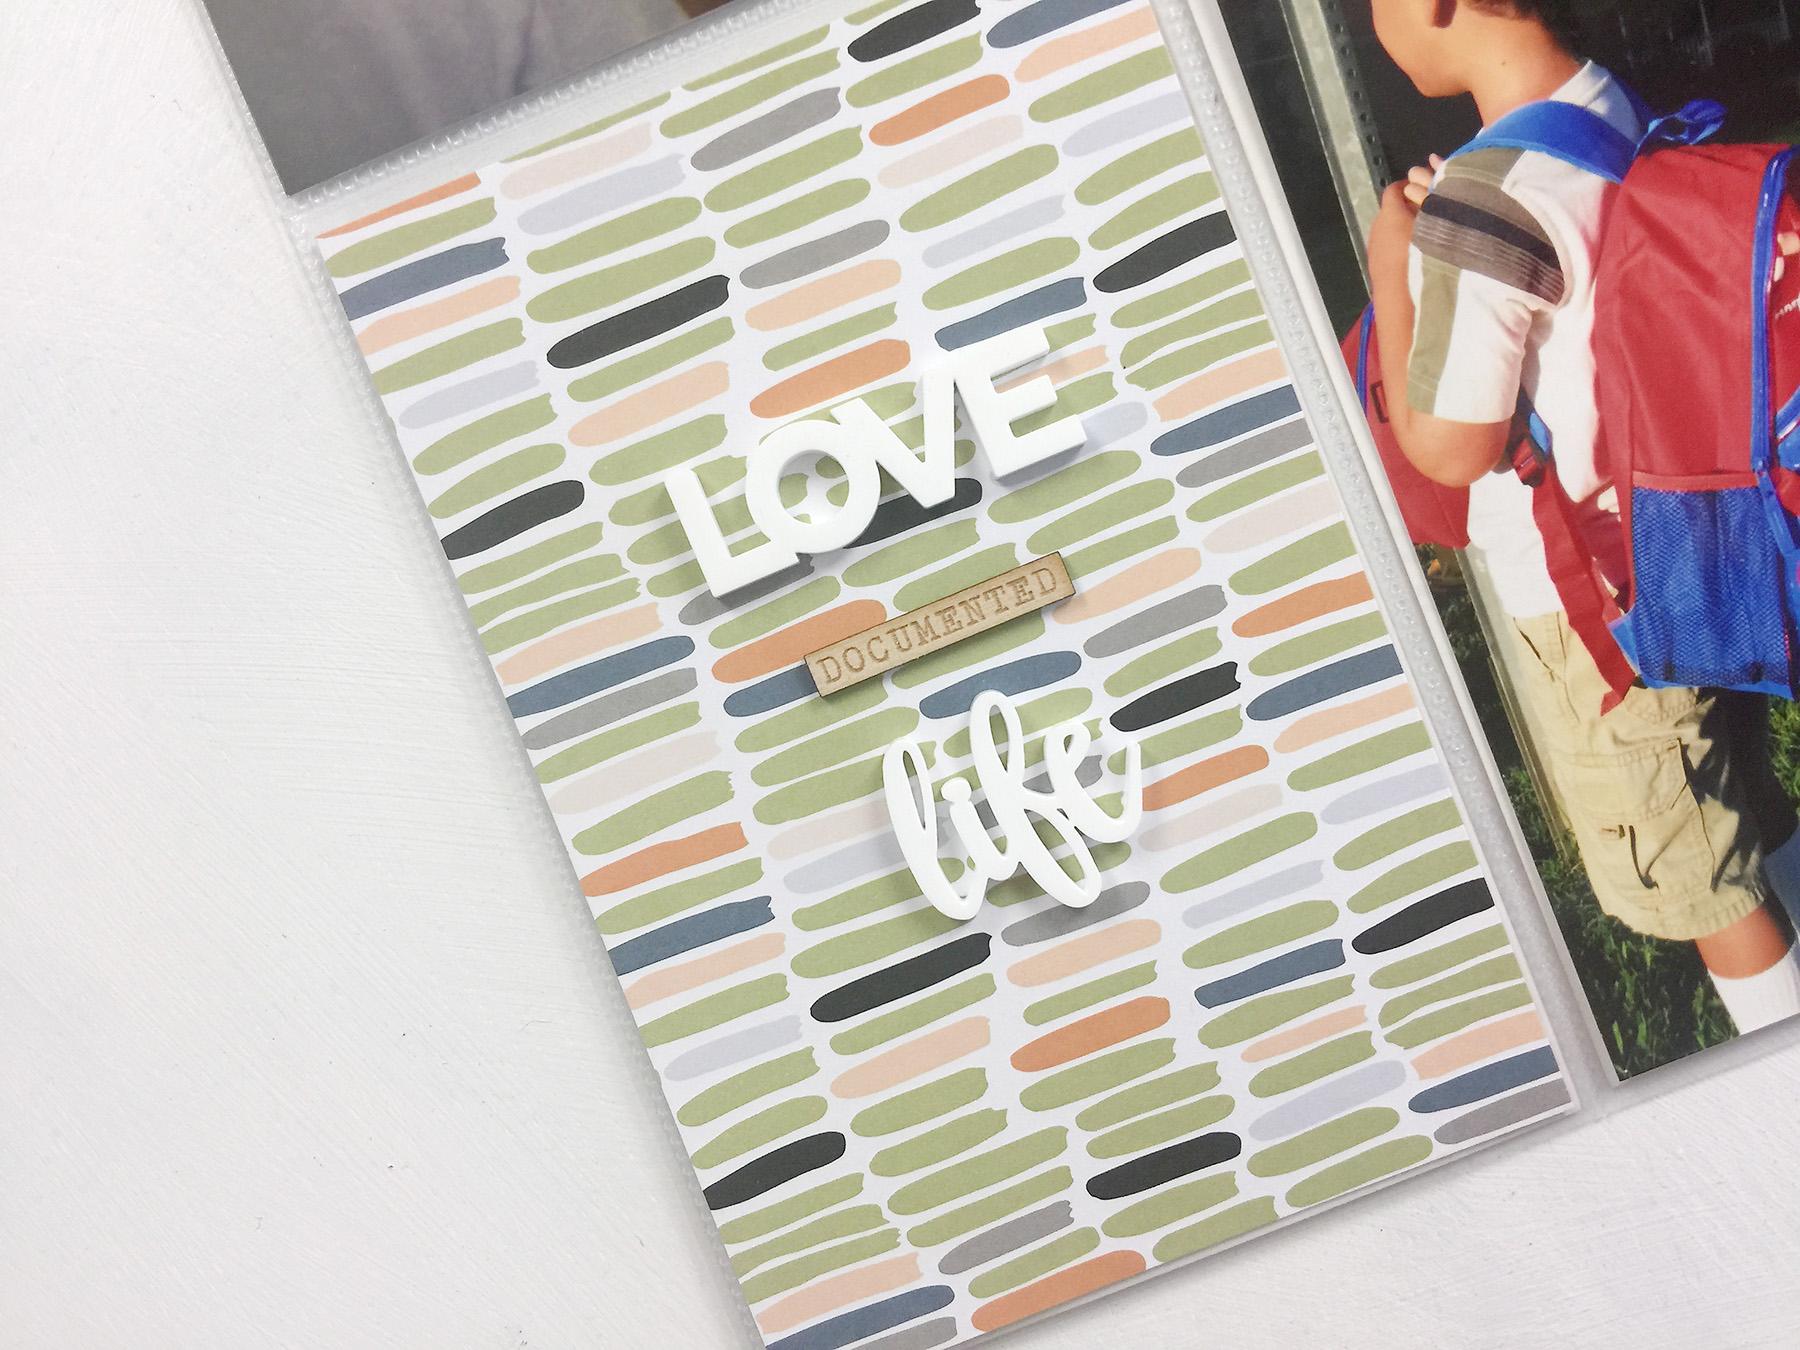 Larkindesign In My Pocket Volume 01